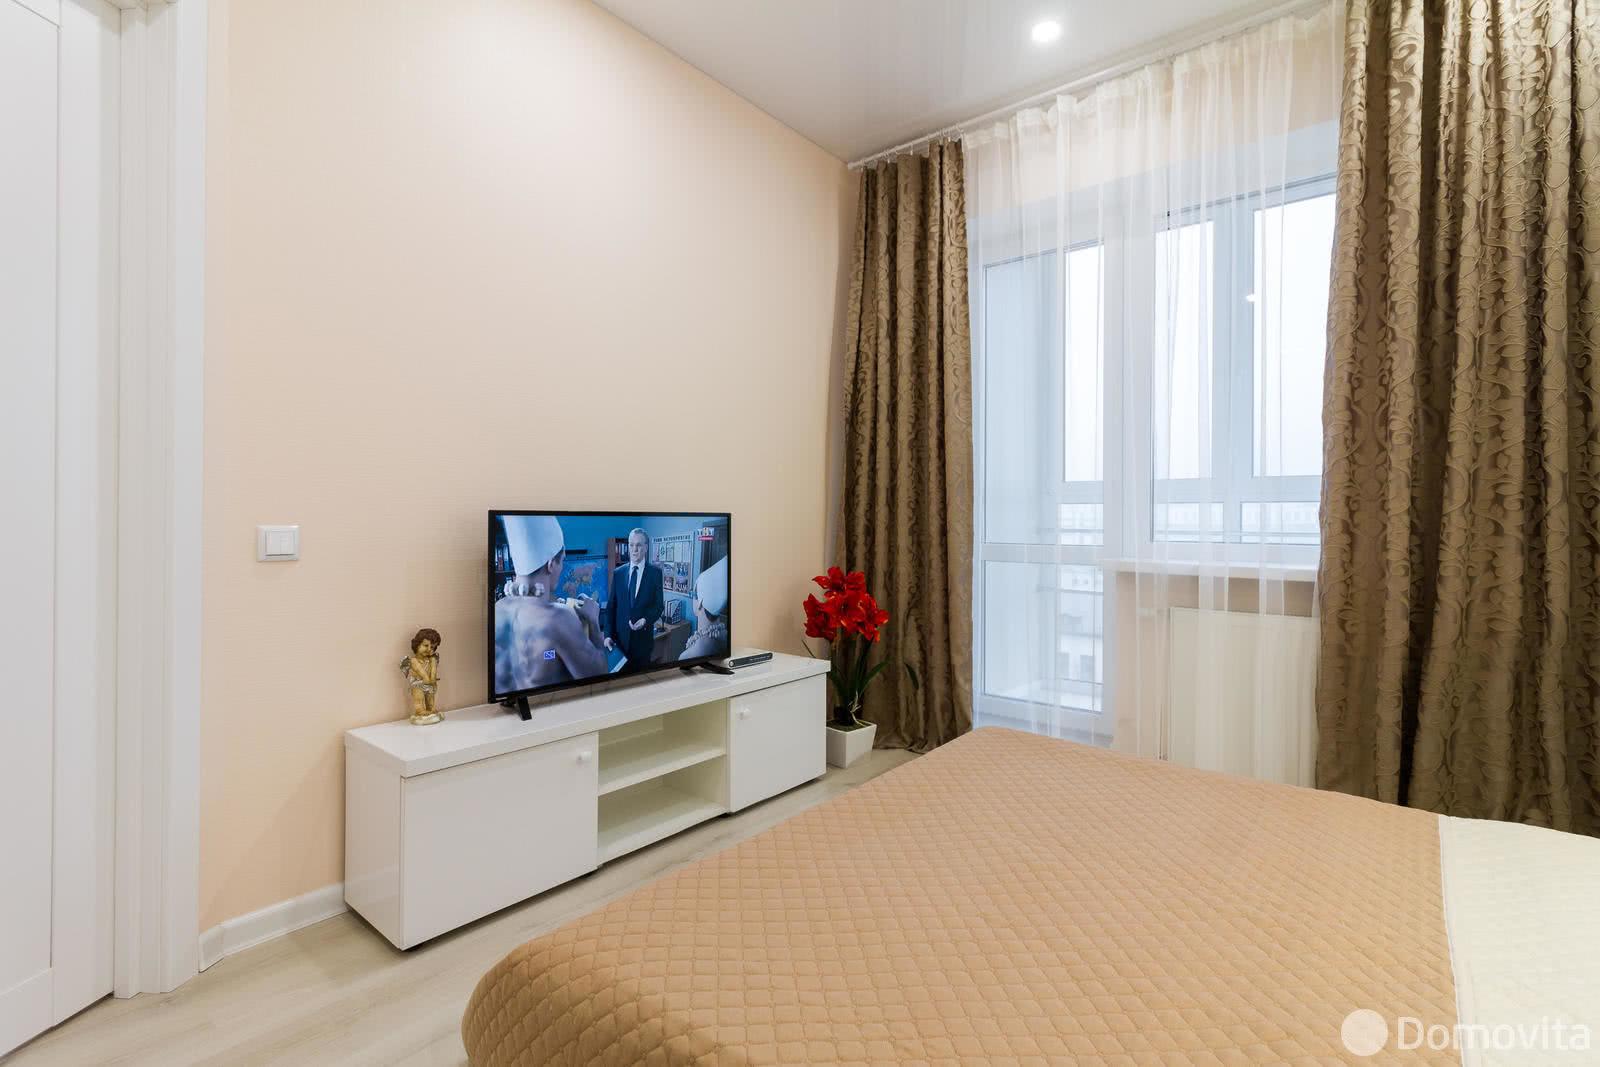 Аренда 2-комнатной квартиры на сутки в Минске, ул. Репина, д. 4 - фото 2